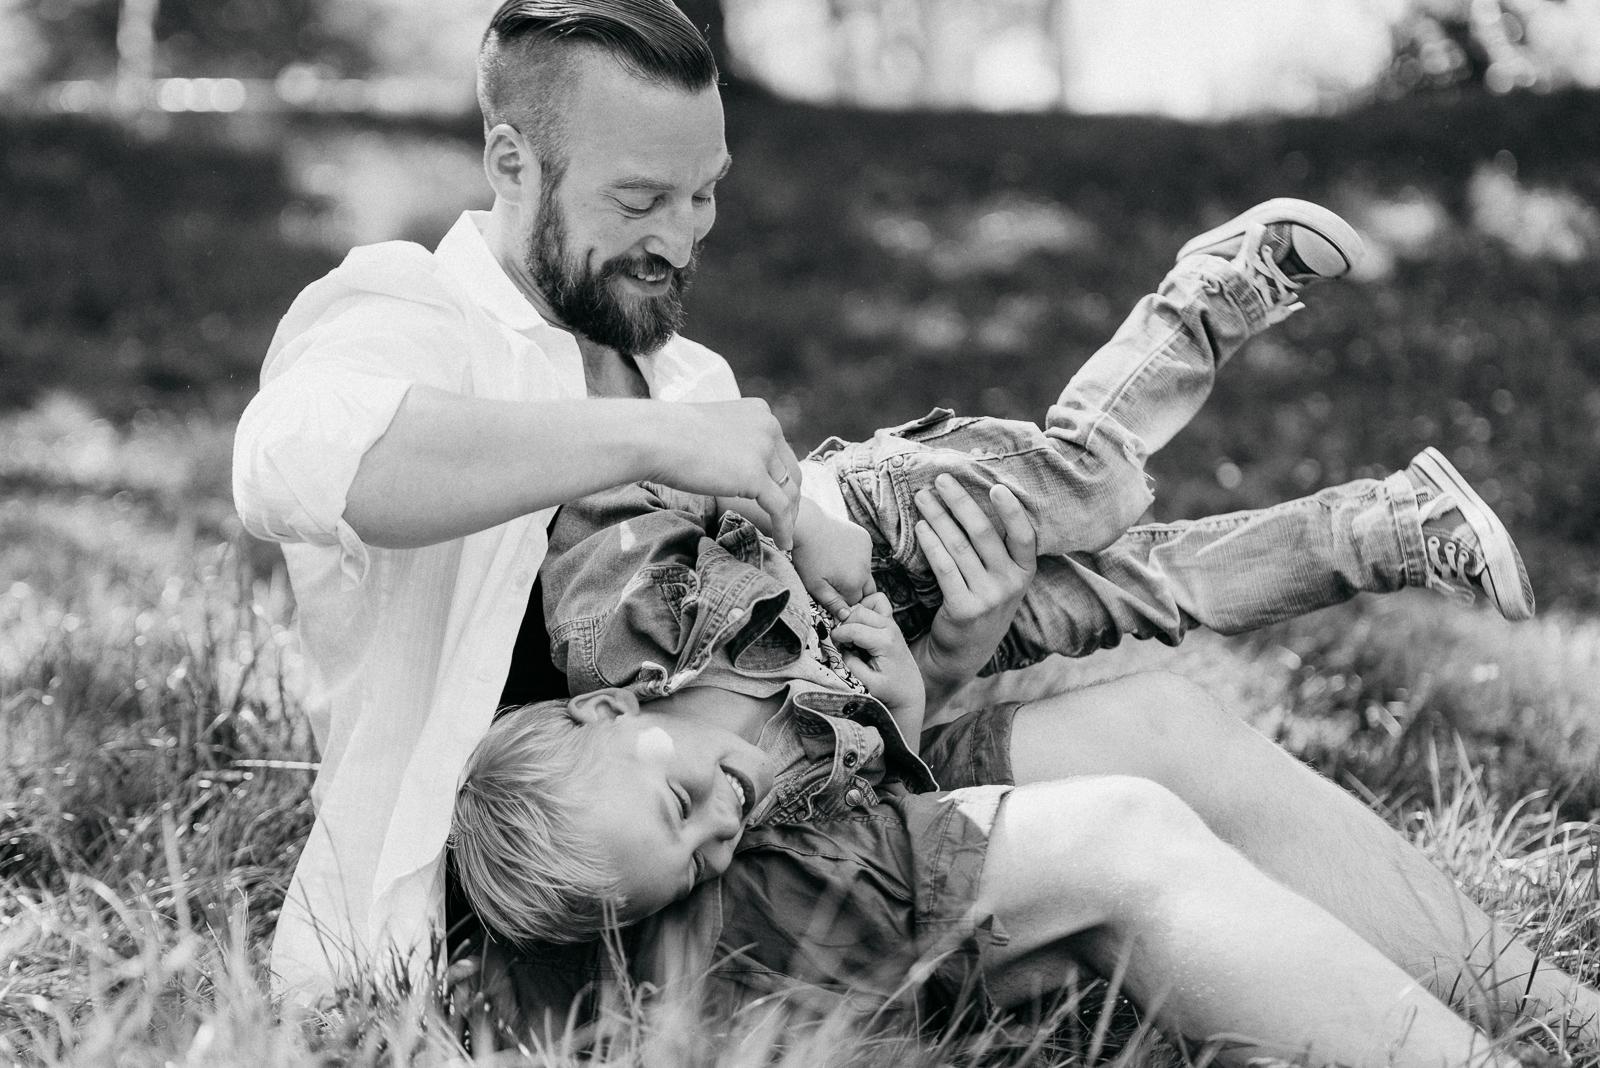 027-designparaplus-familie-fotografie-essen-familienshooting